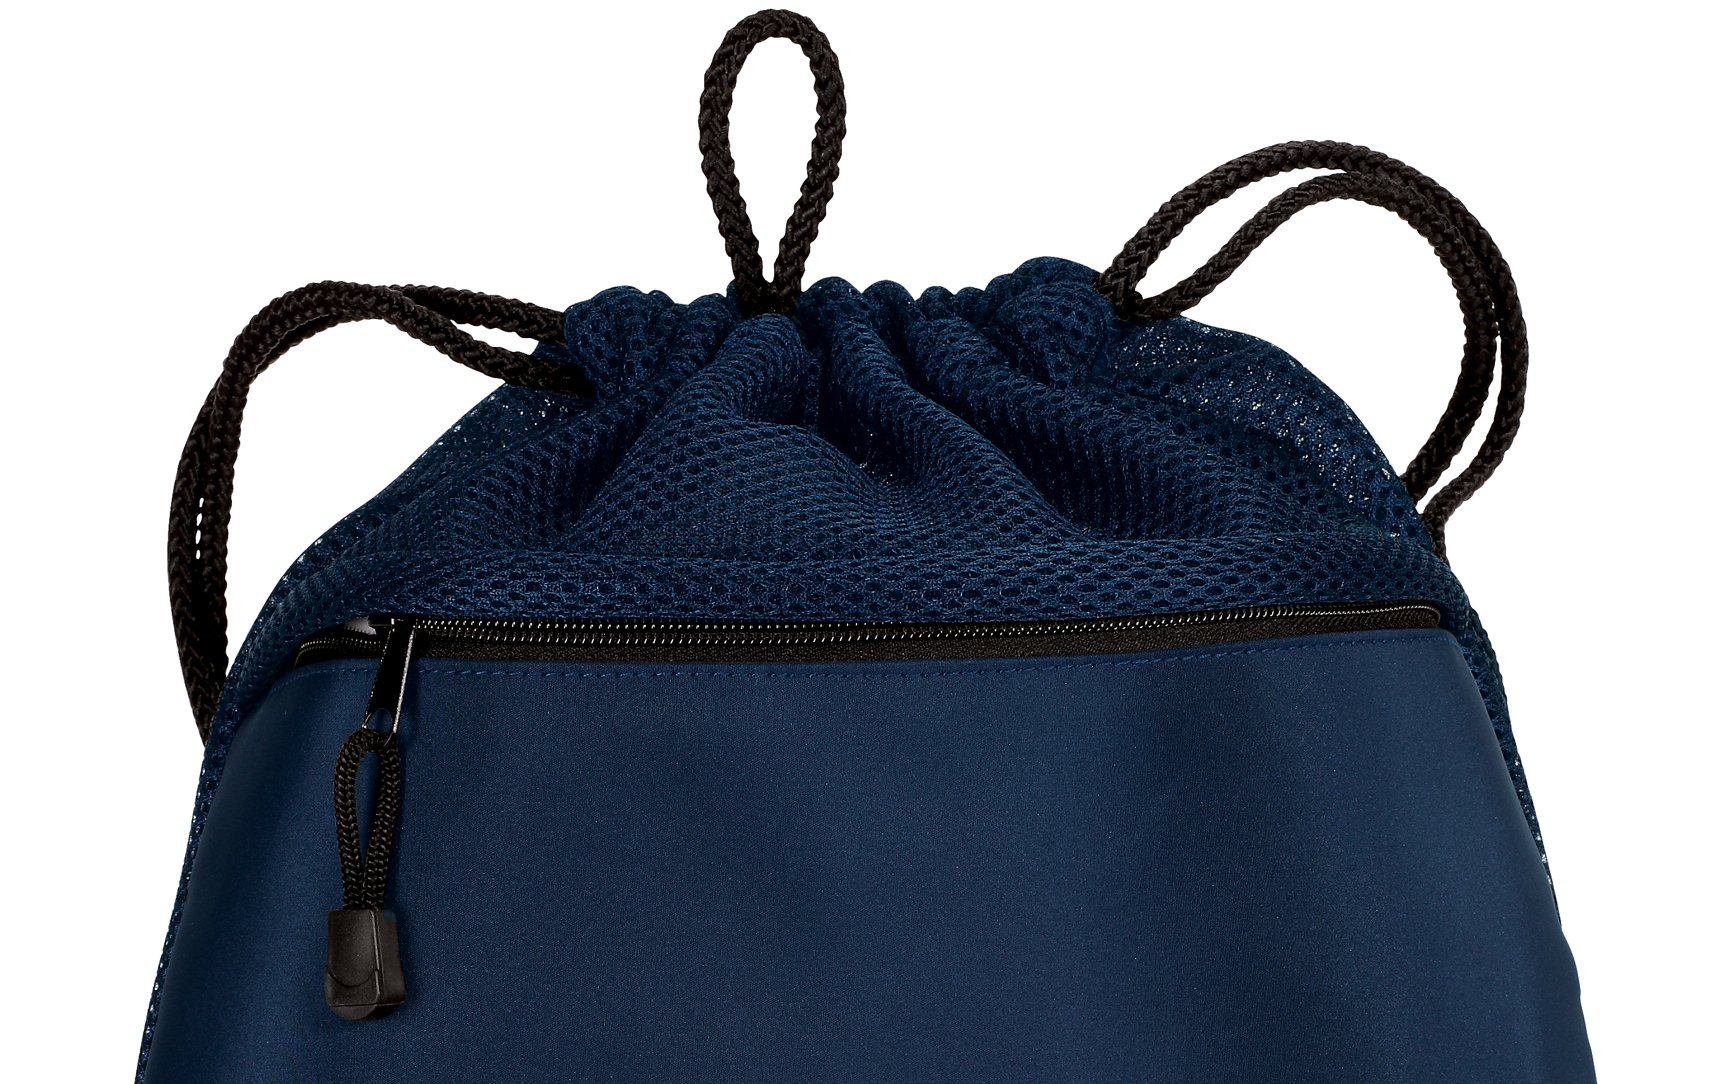 Broad Bay University of Mississippi Drawstring Backpack Ole Miss Cinch Bag - UNIQUE MESH & MICROFIBER by Broad Bay (Image #4)